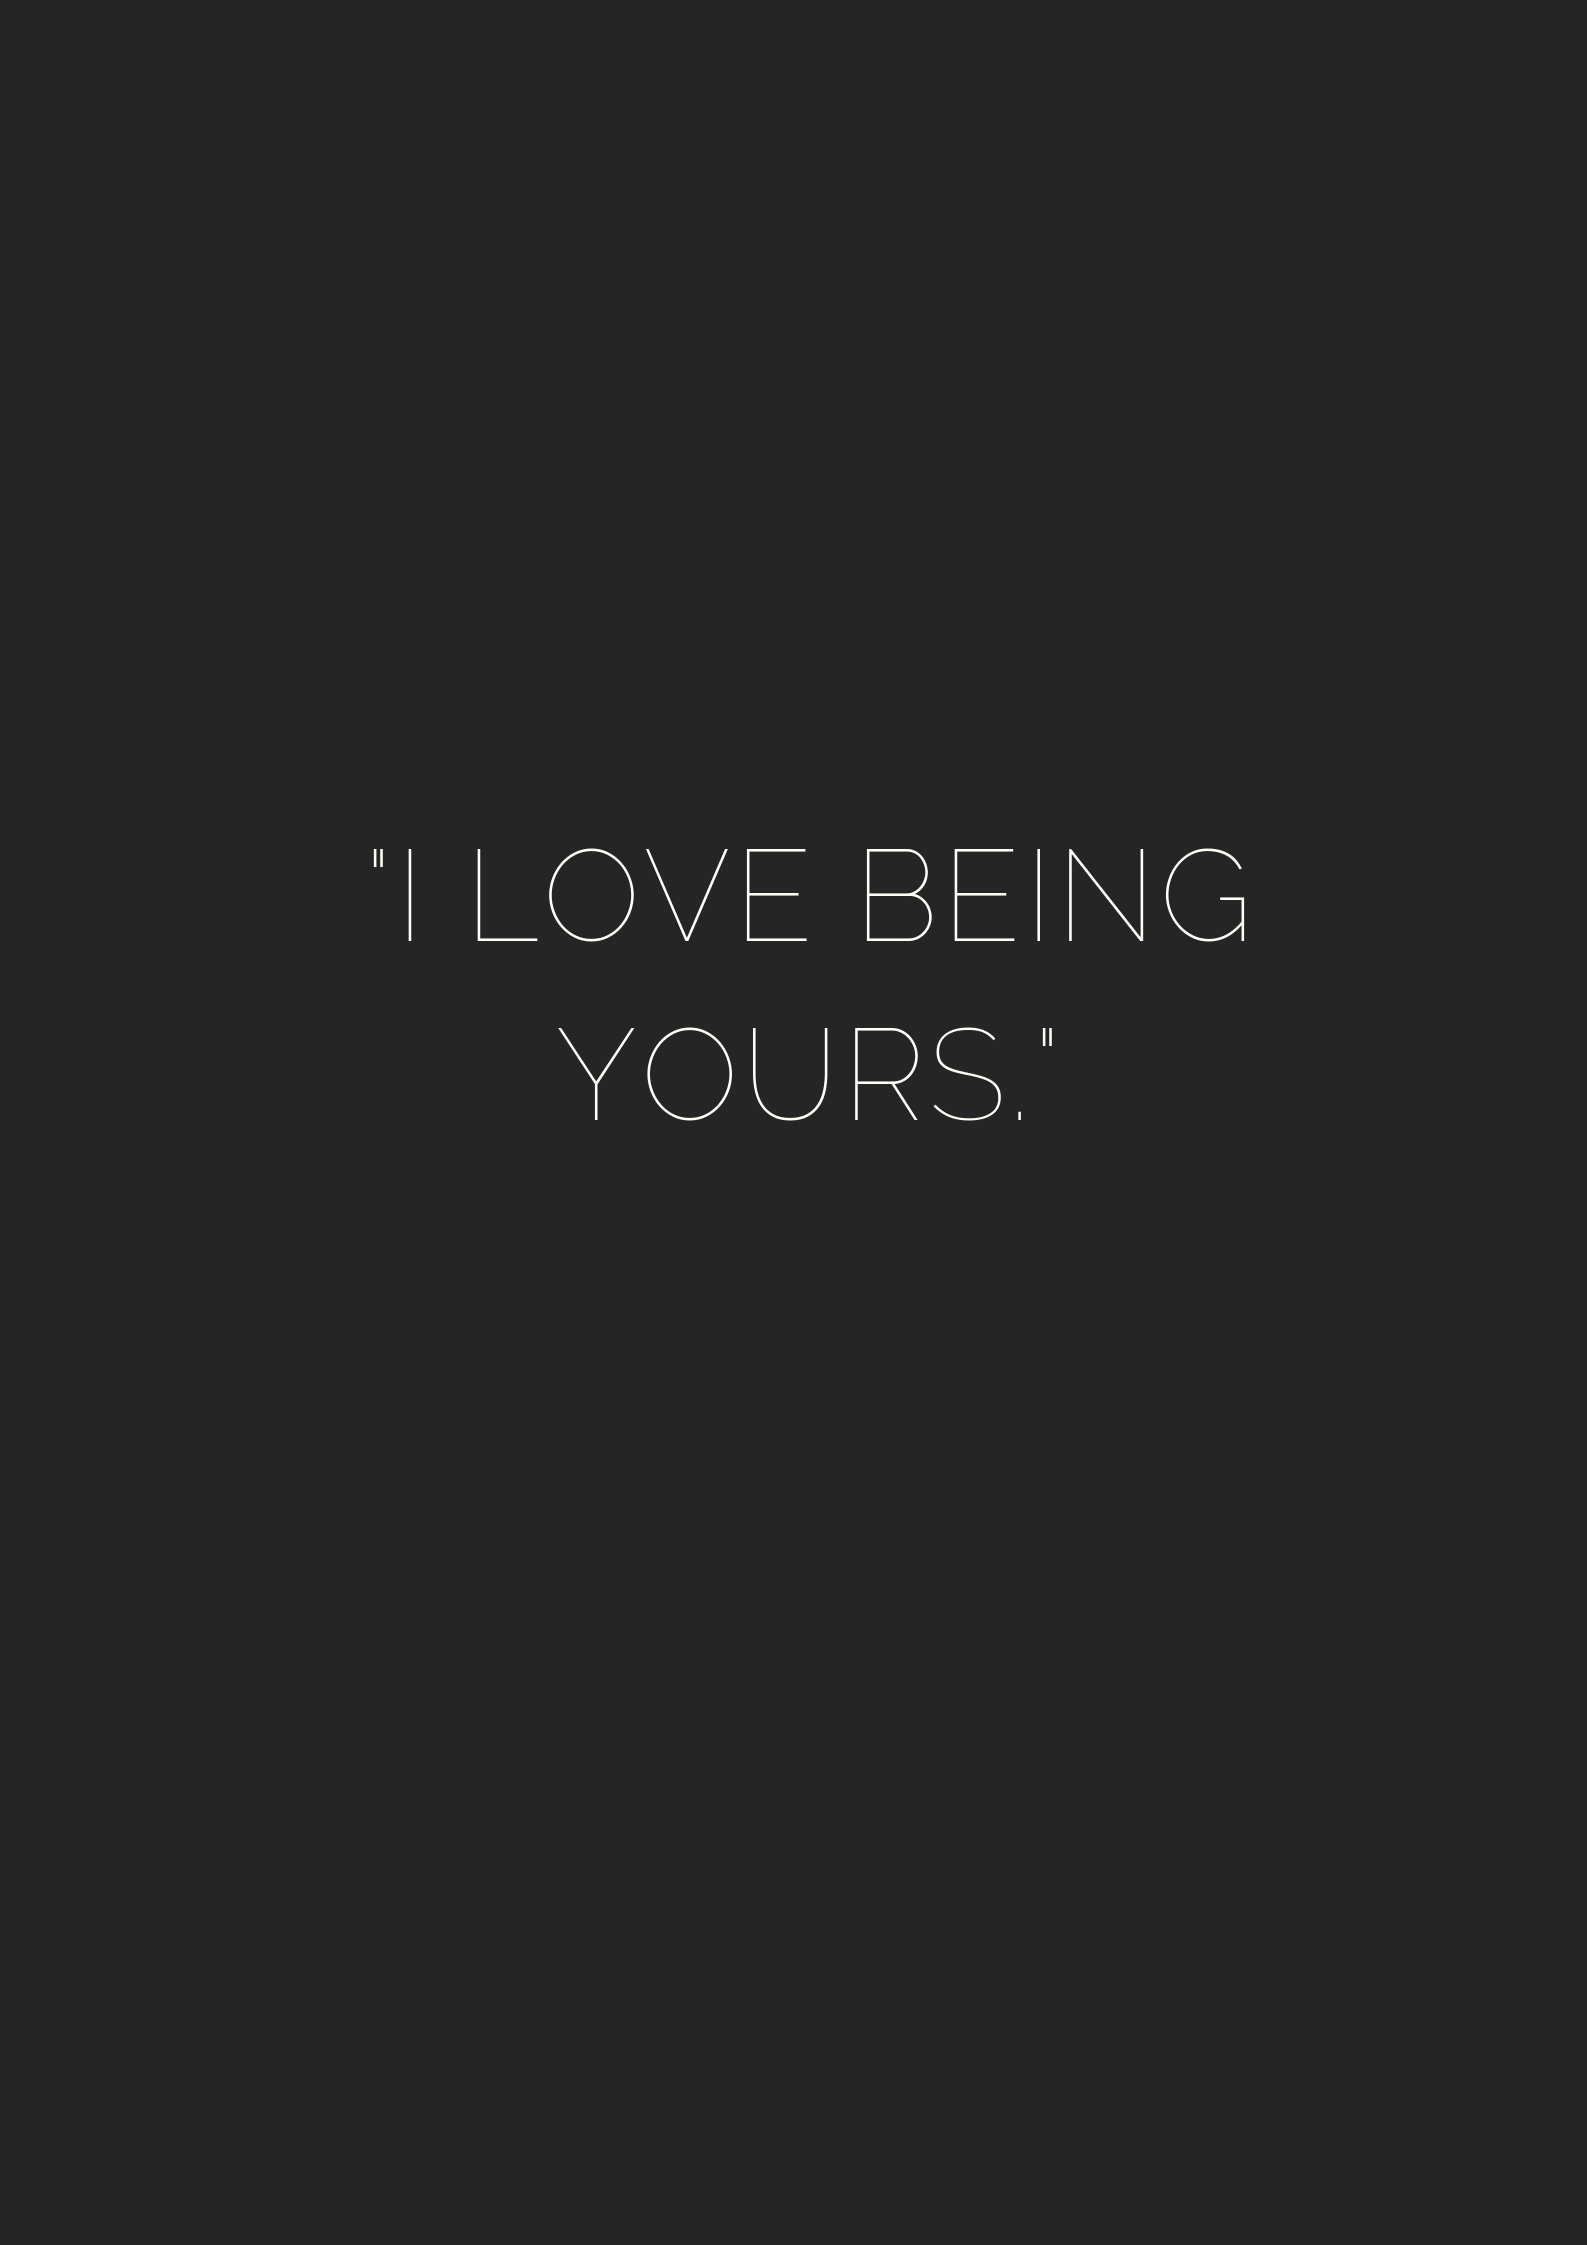 160 Quirky Love Quotes Short Romantic Quotes Cheesy Love Quotes Simple Love Quotes